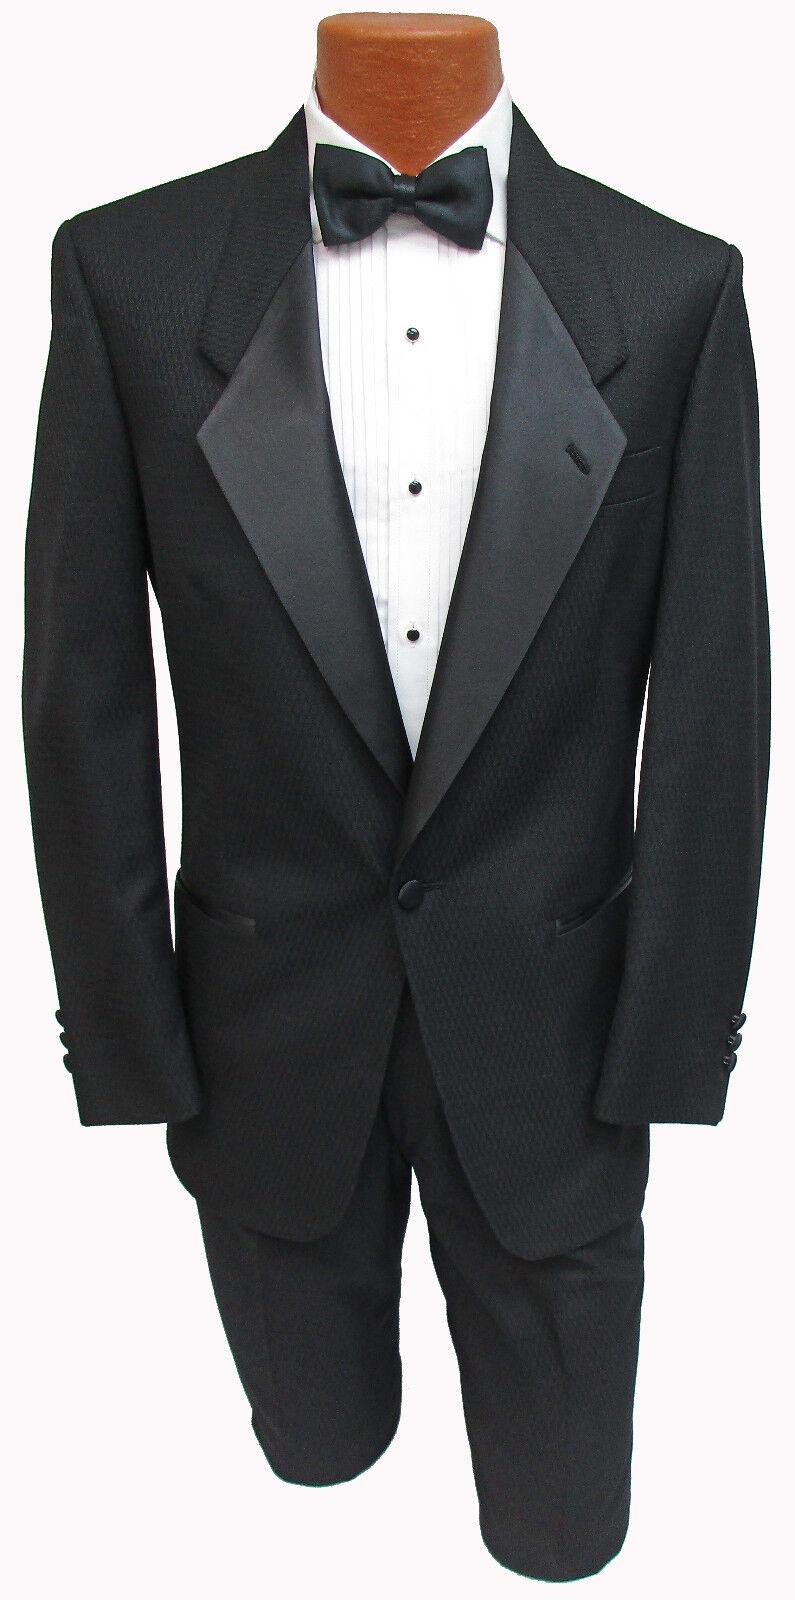 New Men's Black Christian Dior Tuxedo Jacket Retro Wedding Prom Costume